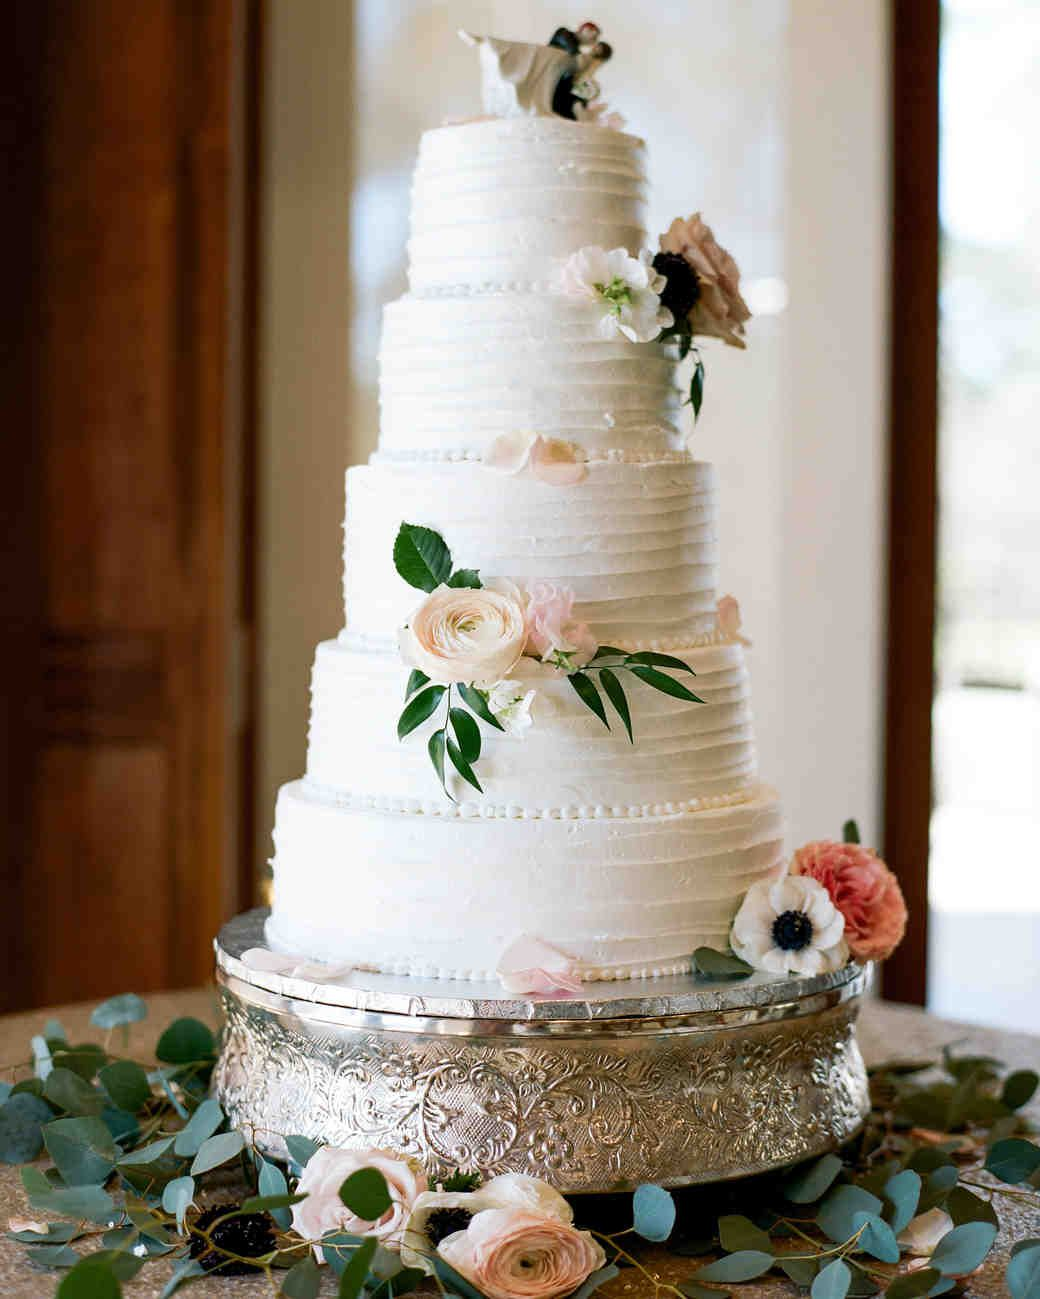 36 Of The Best Wedding Cake Toppers We Ve Ever Seen Martha Stewart Weddings If You L Wedding Cake Fresh Flowers Wedding Cake Decorations Cool Wedding Cakes